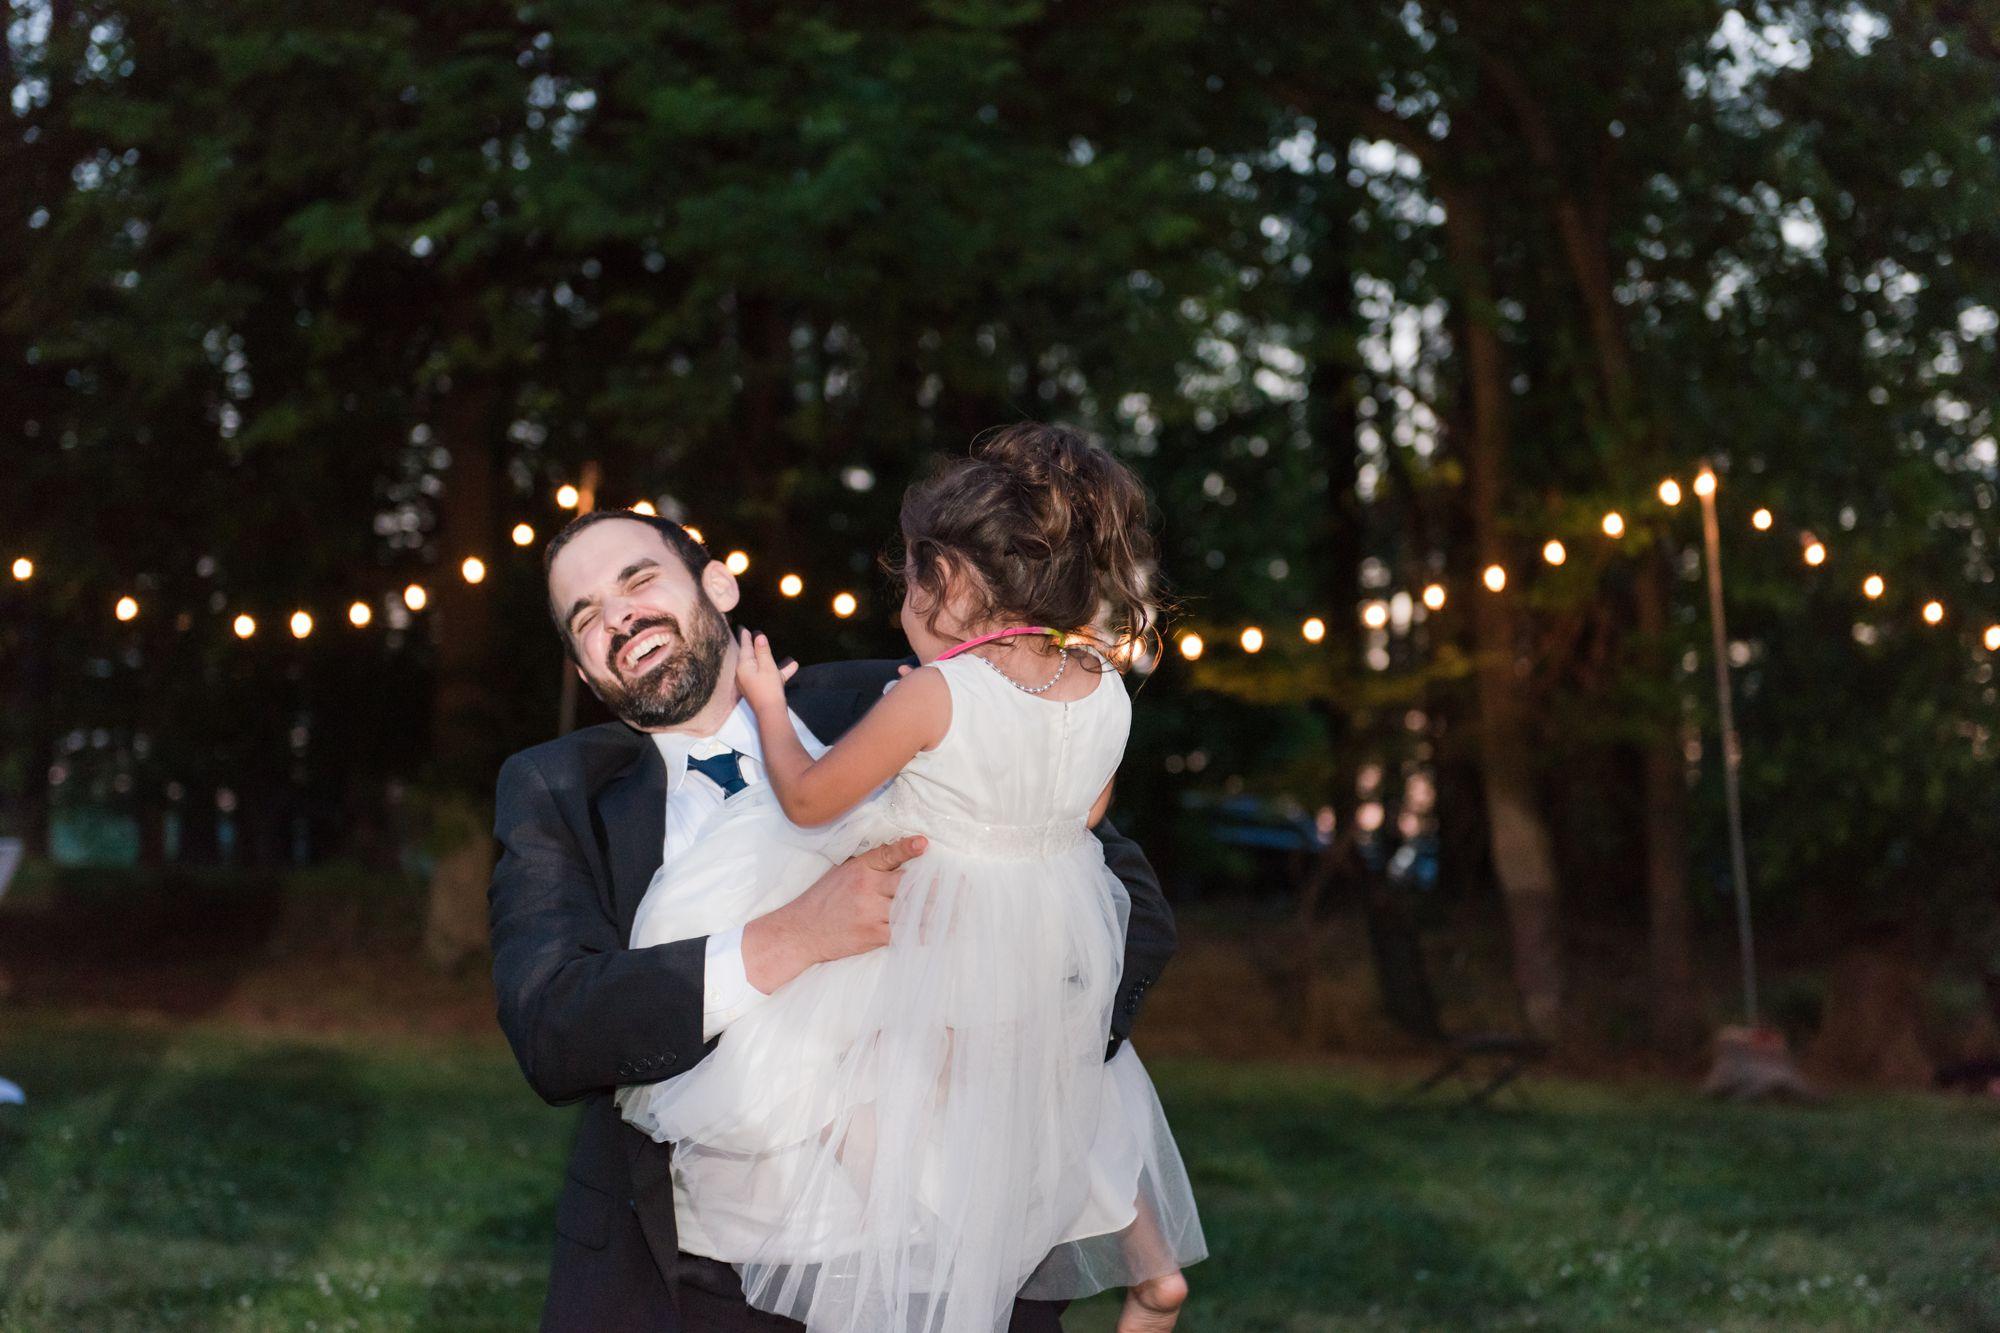 beaver-dam-house-davidson-nc-wedding-photos 103